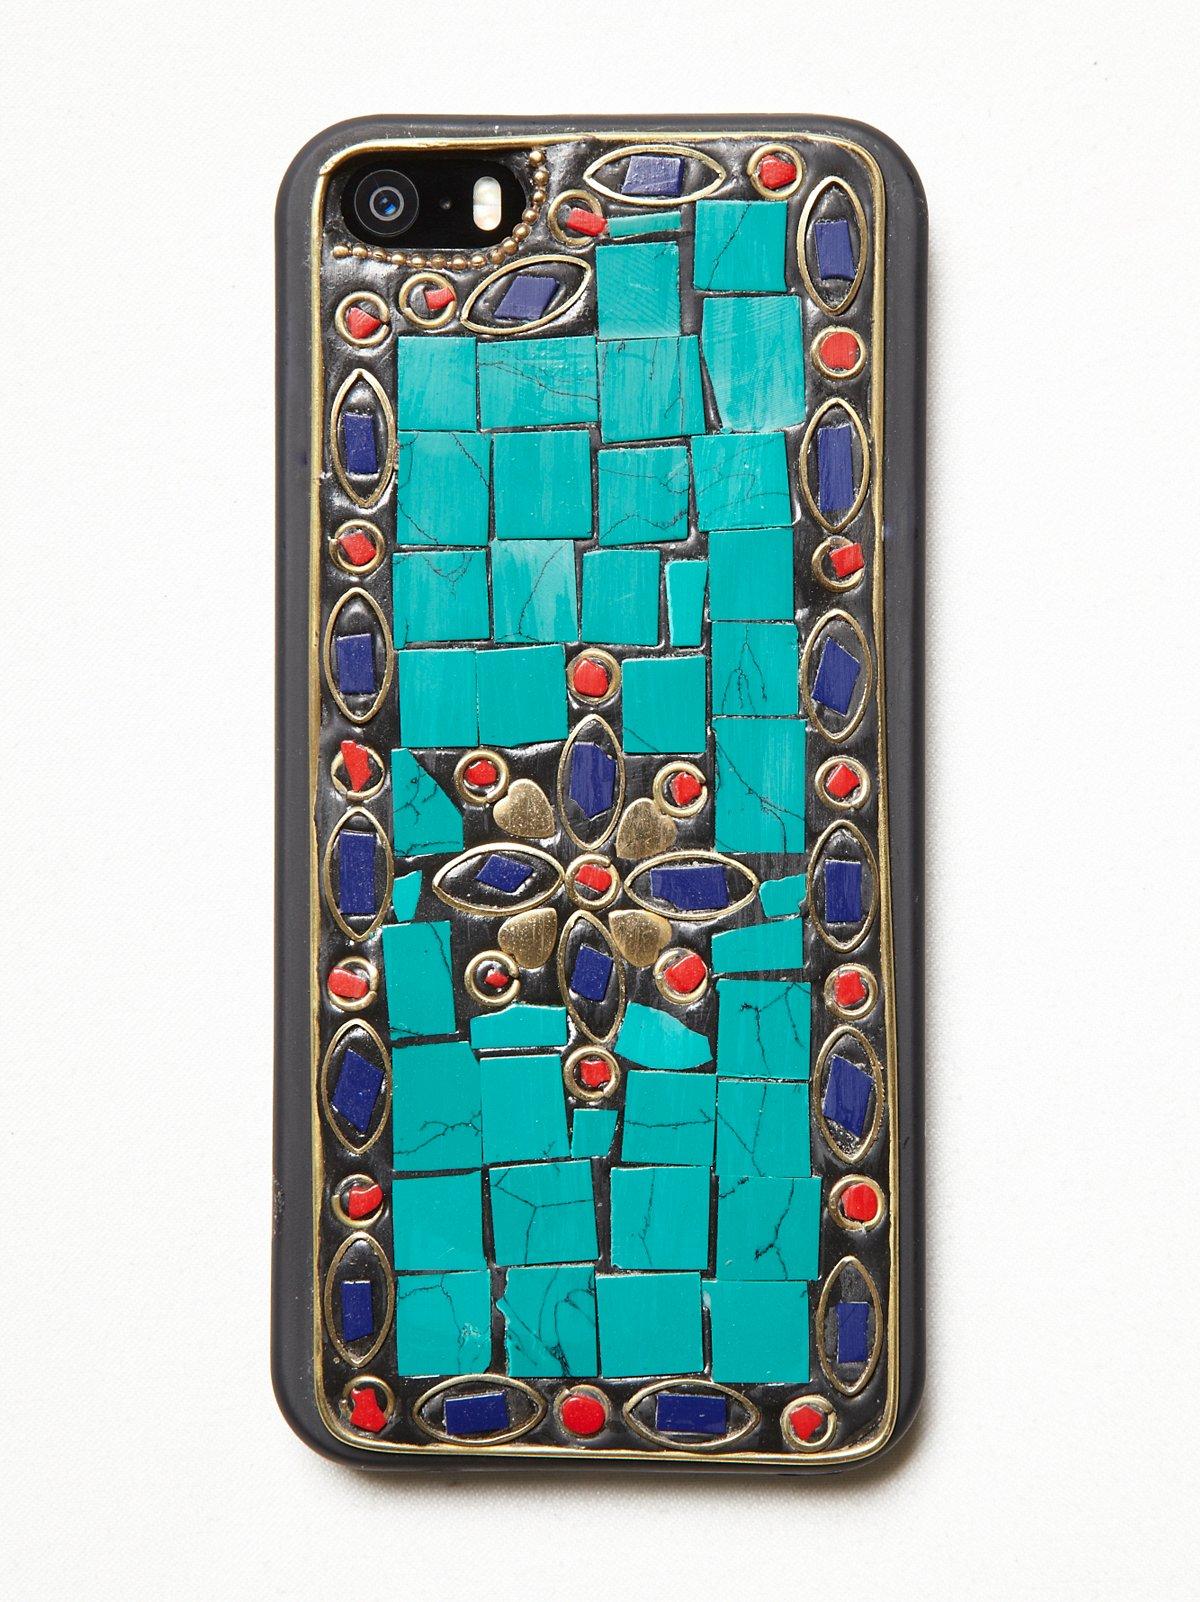 Mosaic iPhone 5 Case